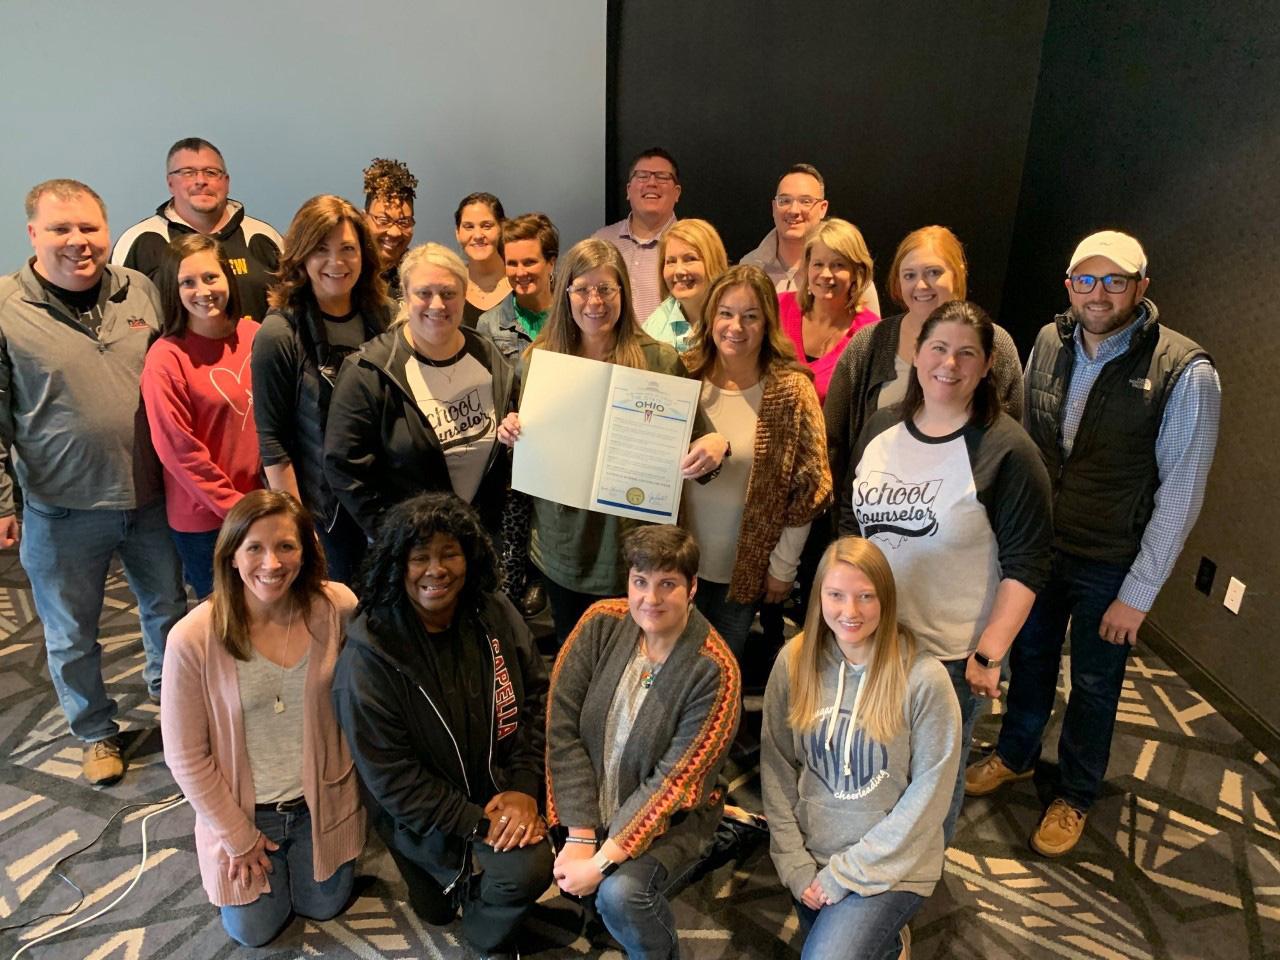 Ohio School Counselor Association - Photo